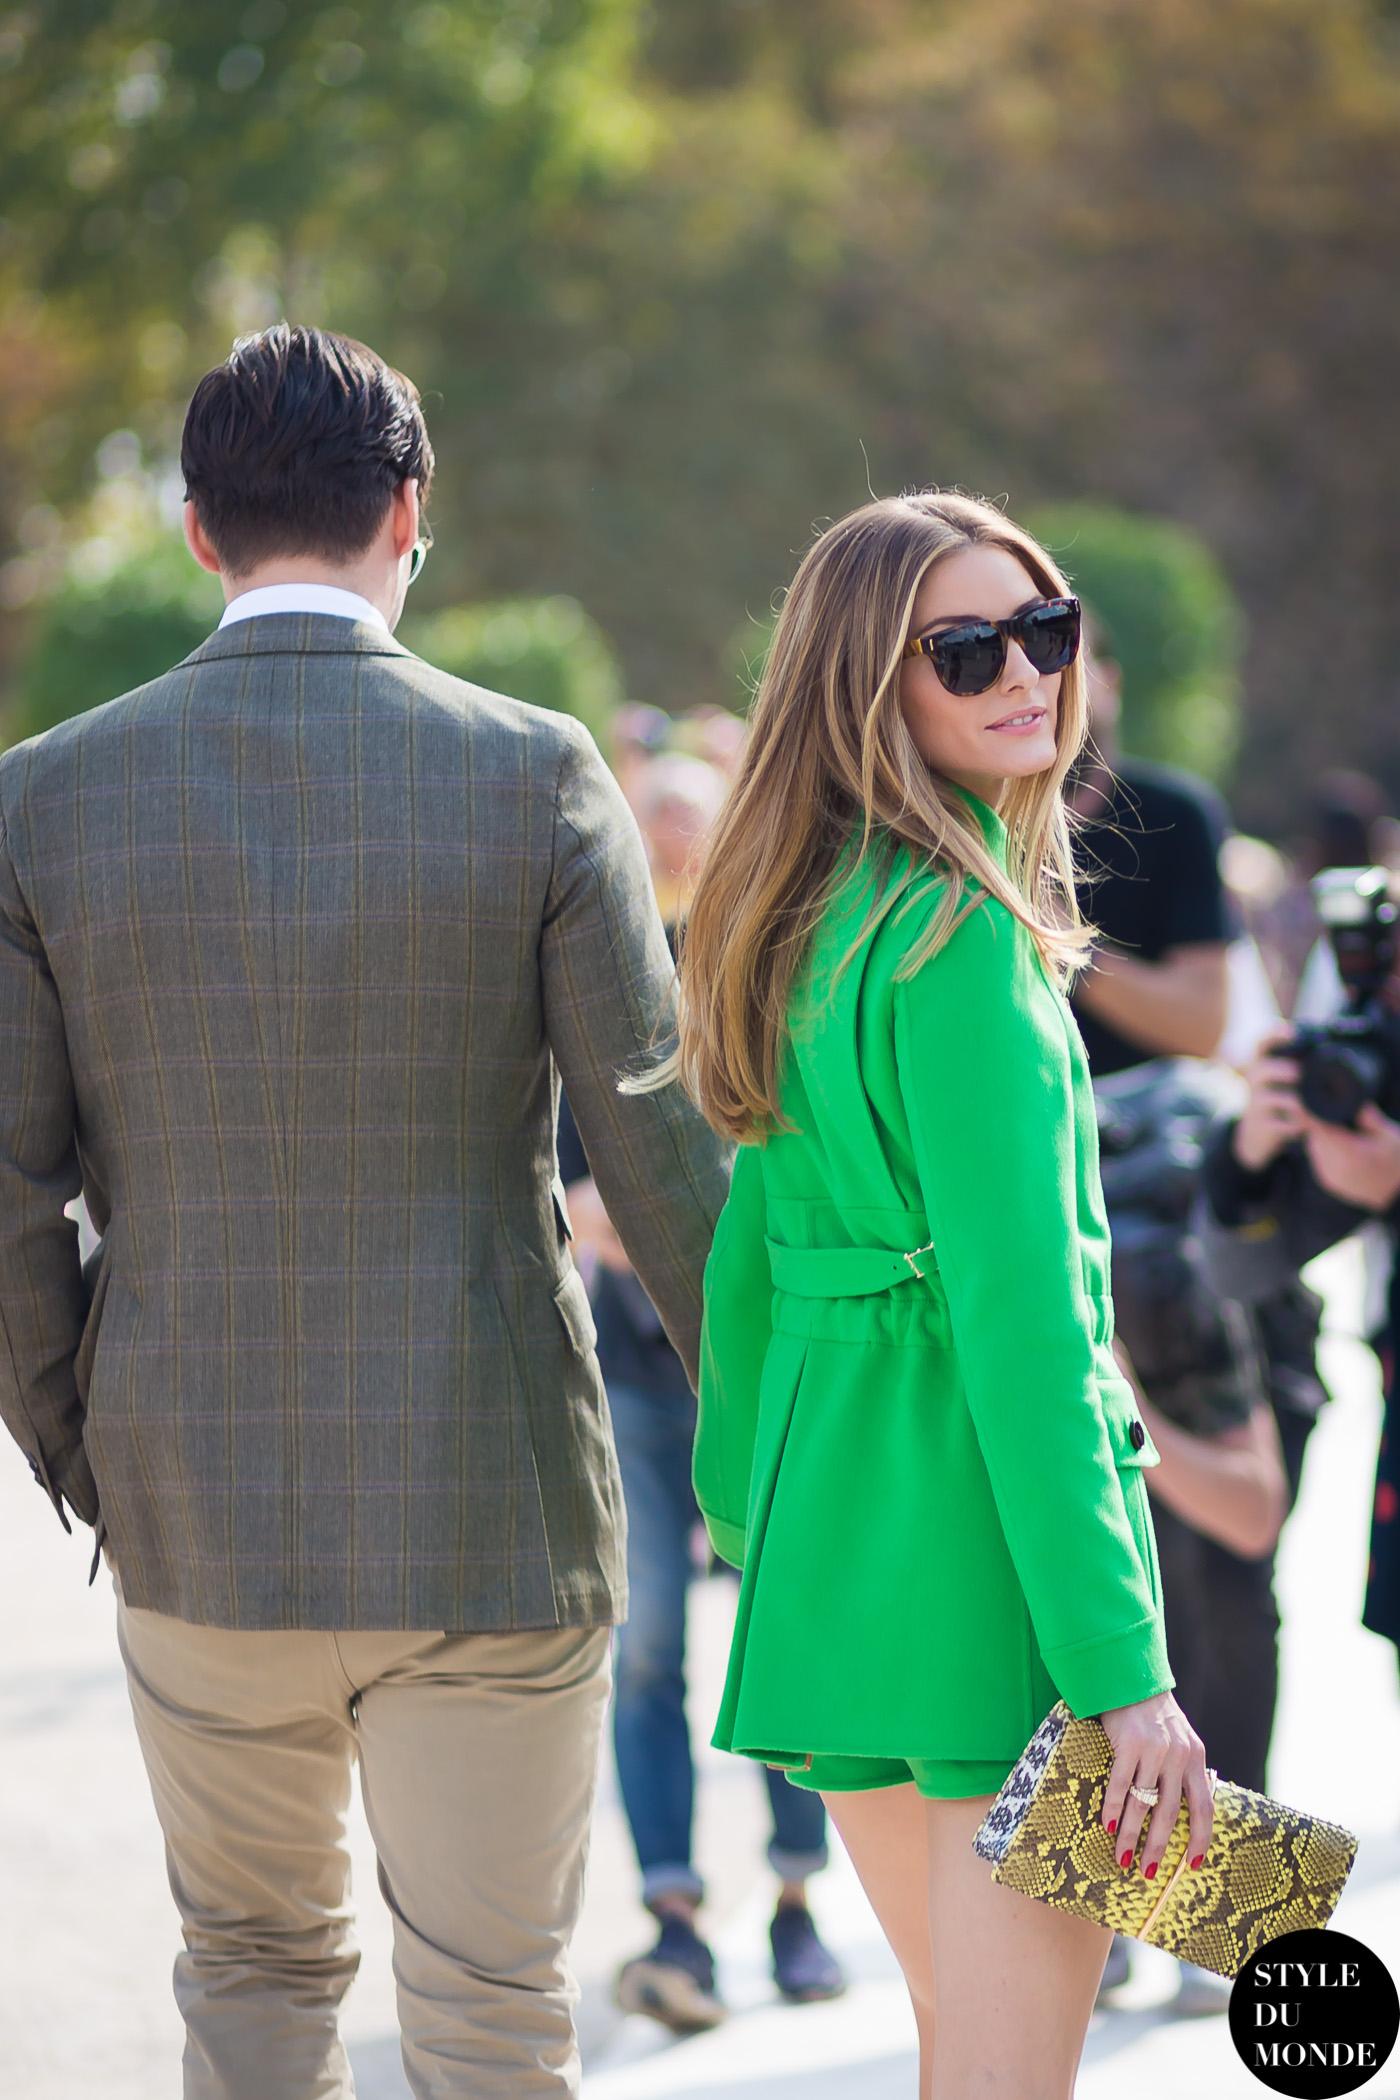 Paris FW SS15 Street Style: Olivia Palermo - STYLE DU ...